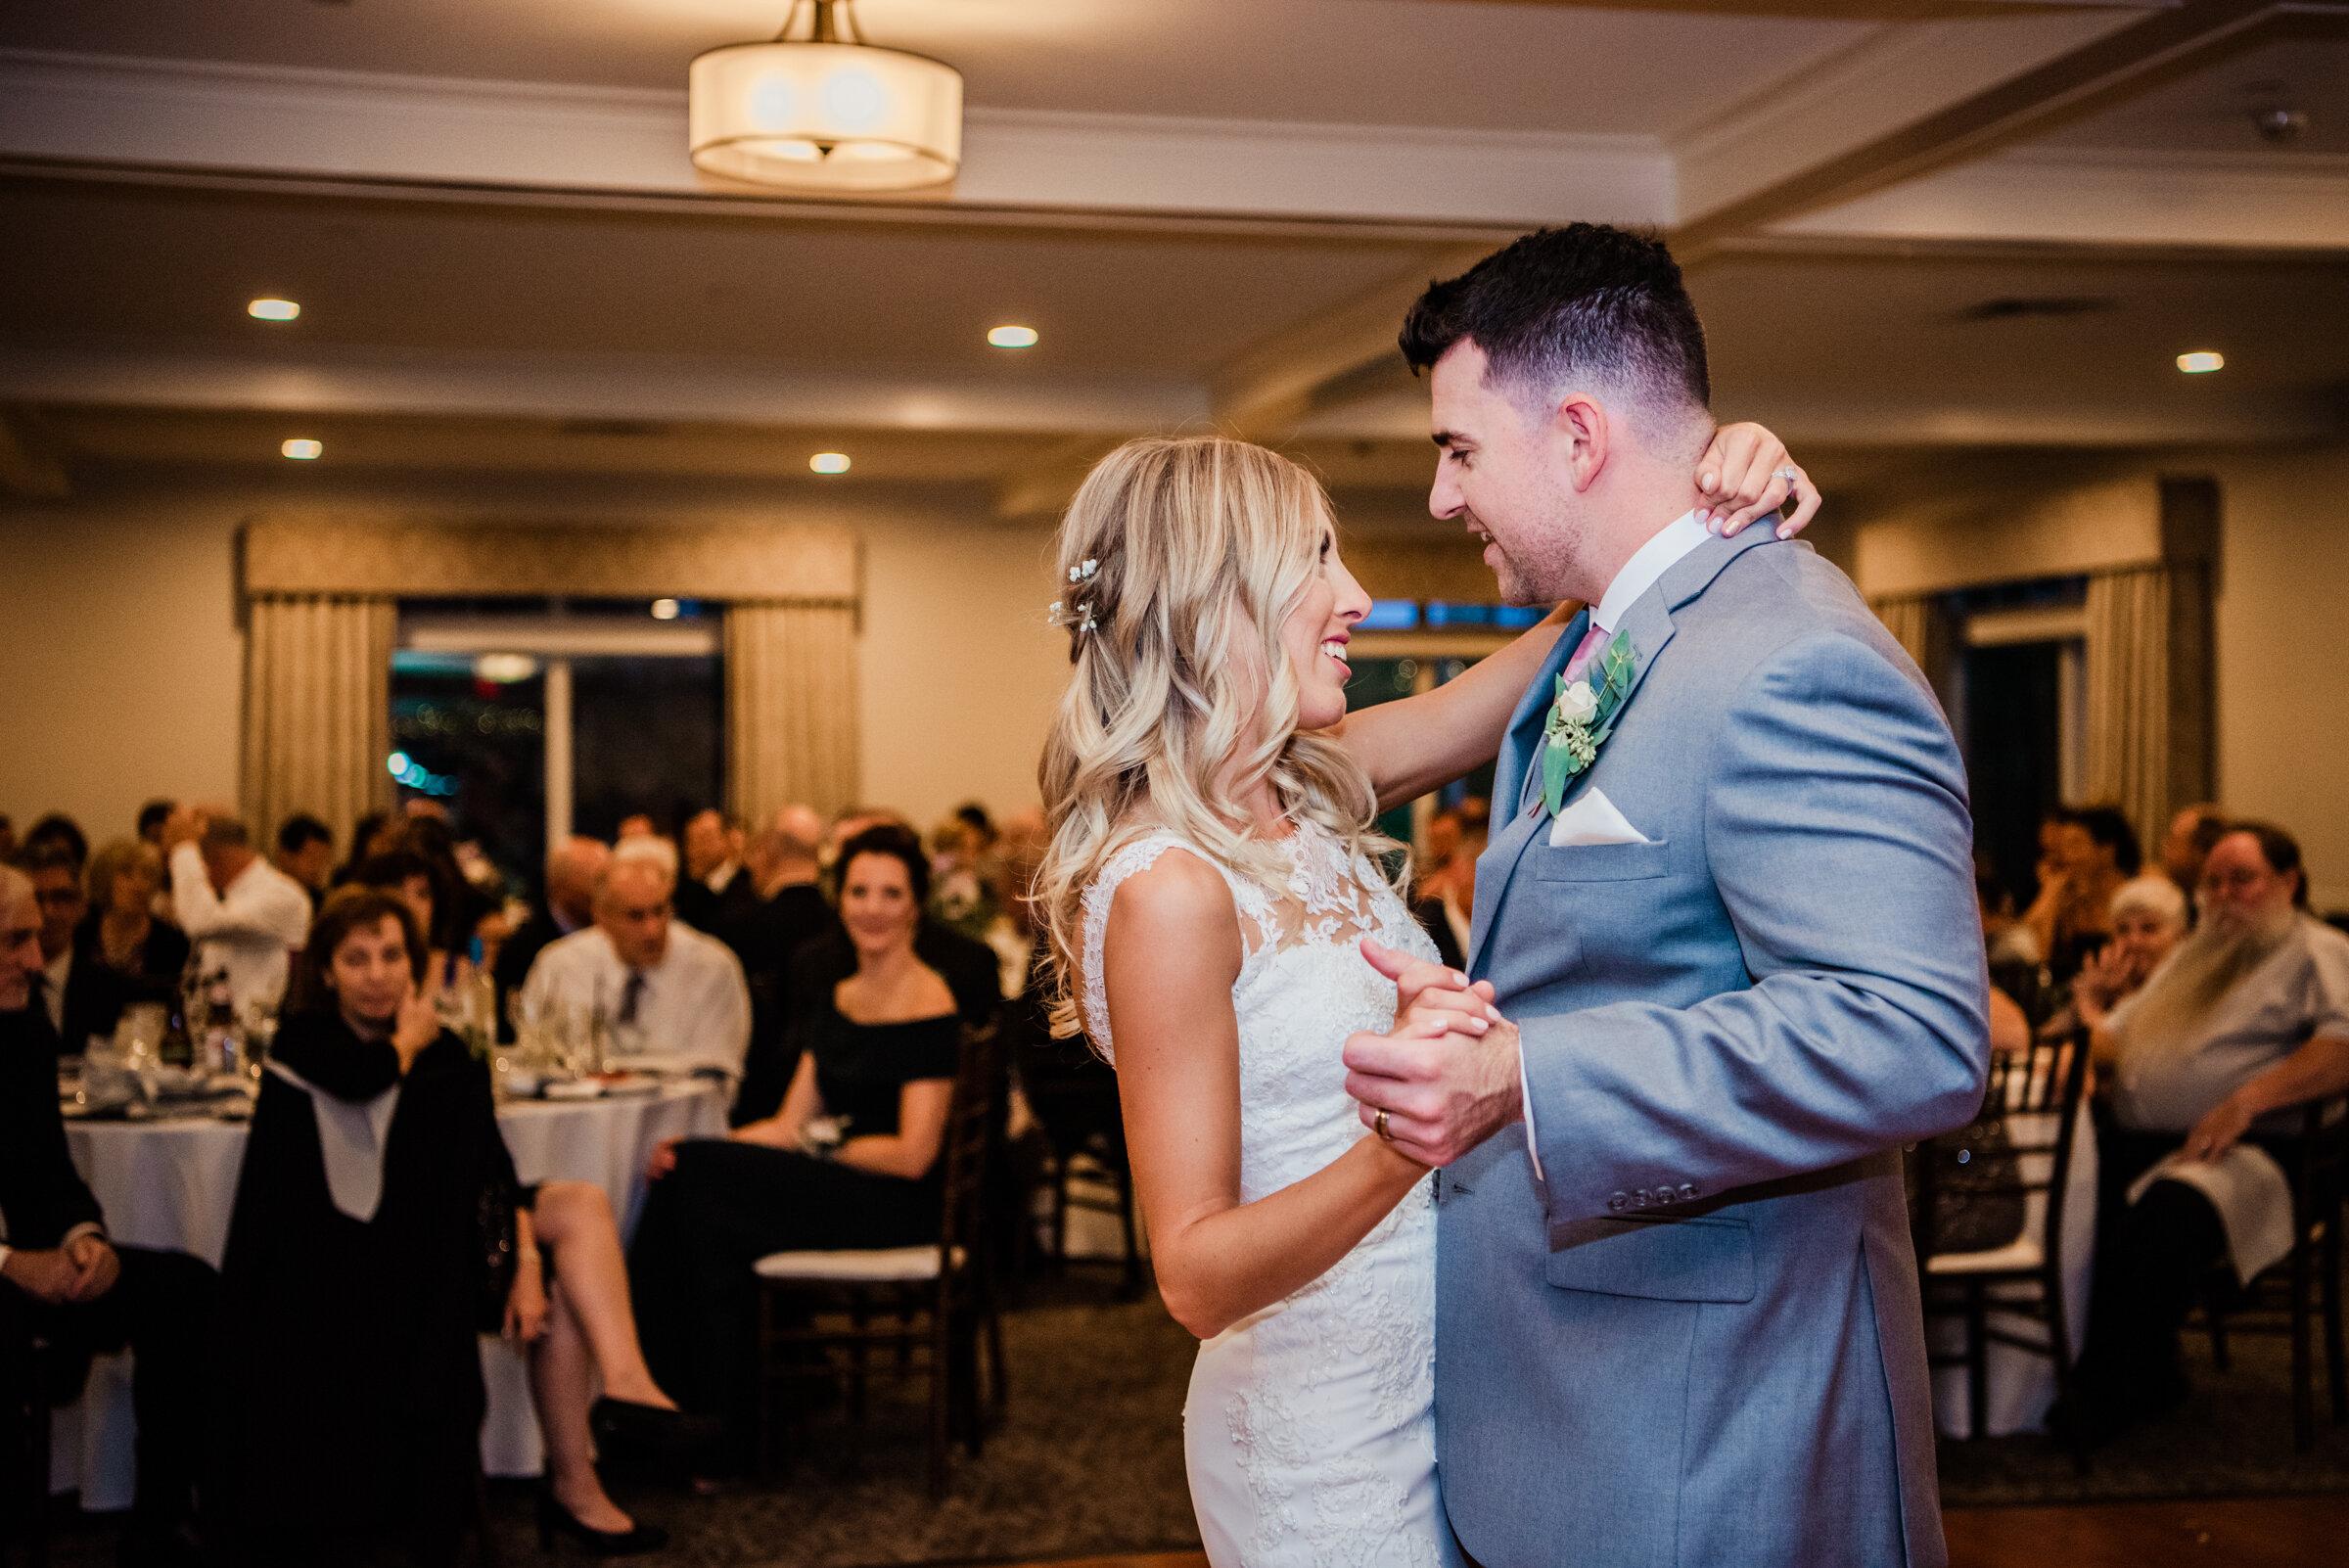 Deerfield_Country_Club_Rochester_Wedding_JILL_STUDIO_Rochester_NY_Photographer_DSC_7144.jpg